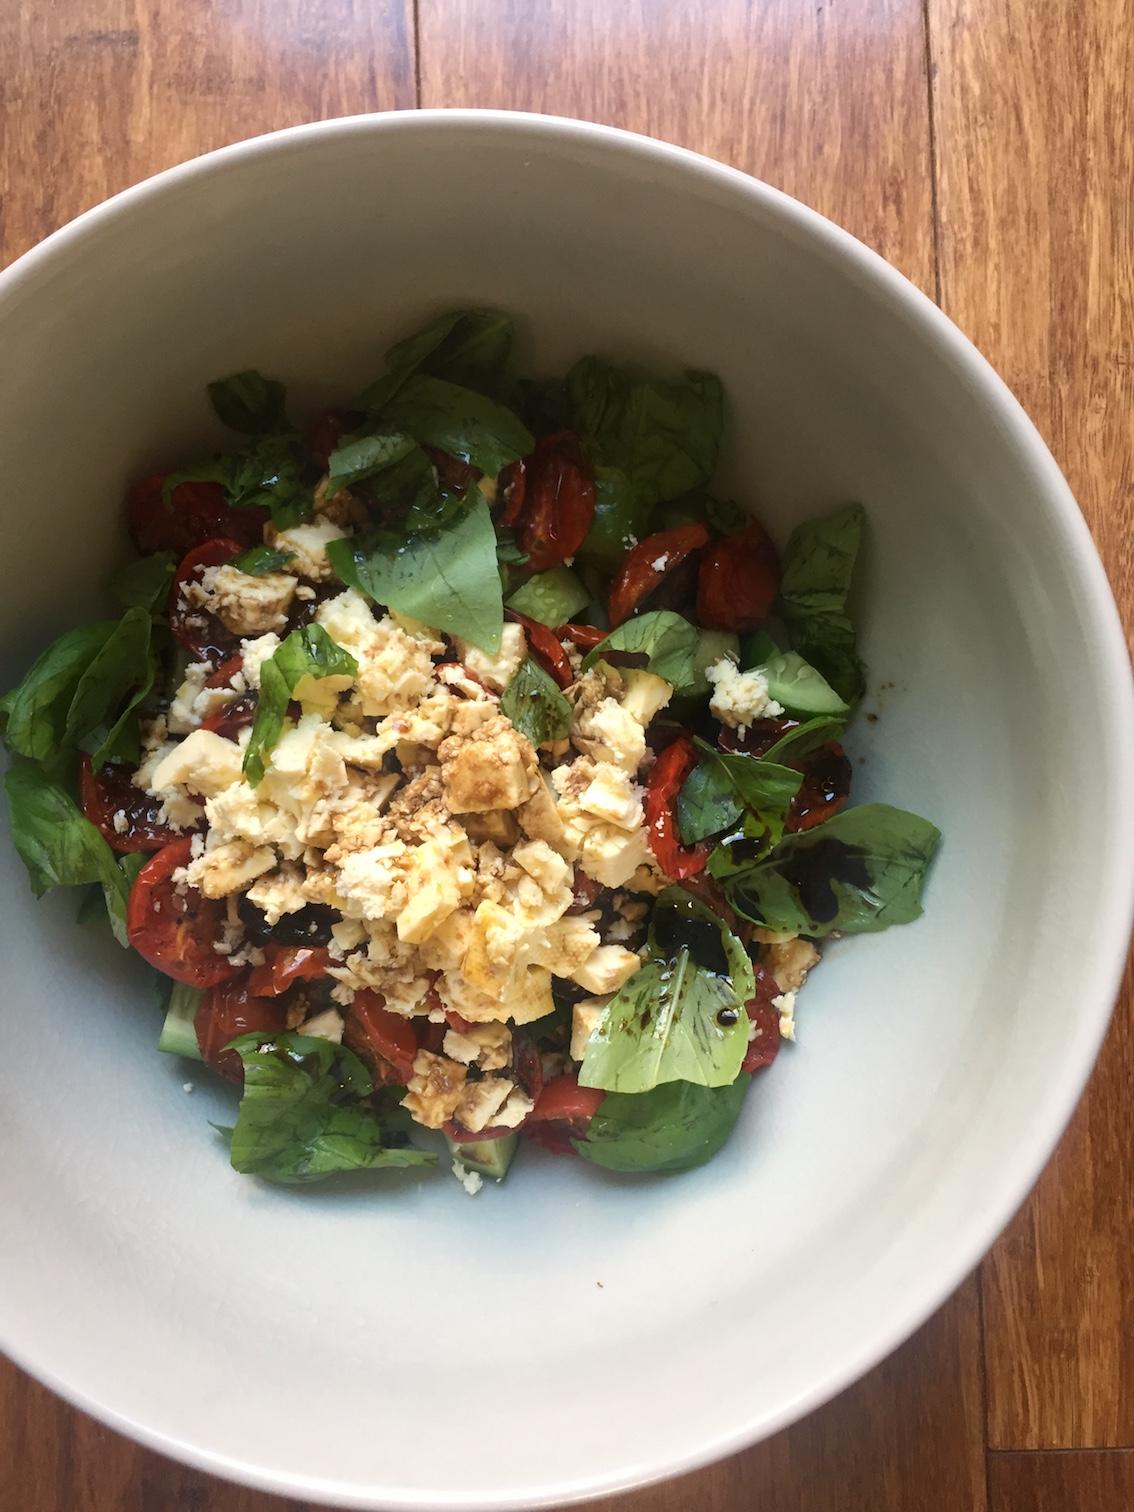 Delicious Greek-style salad